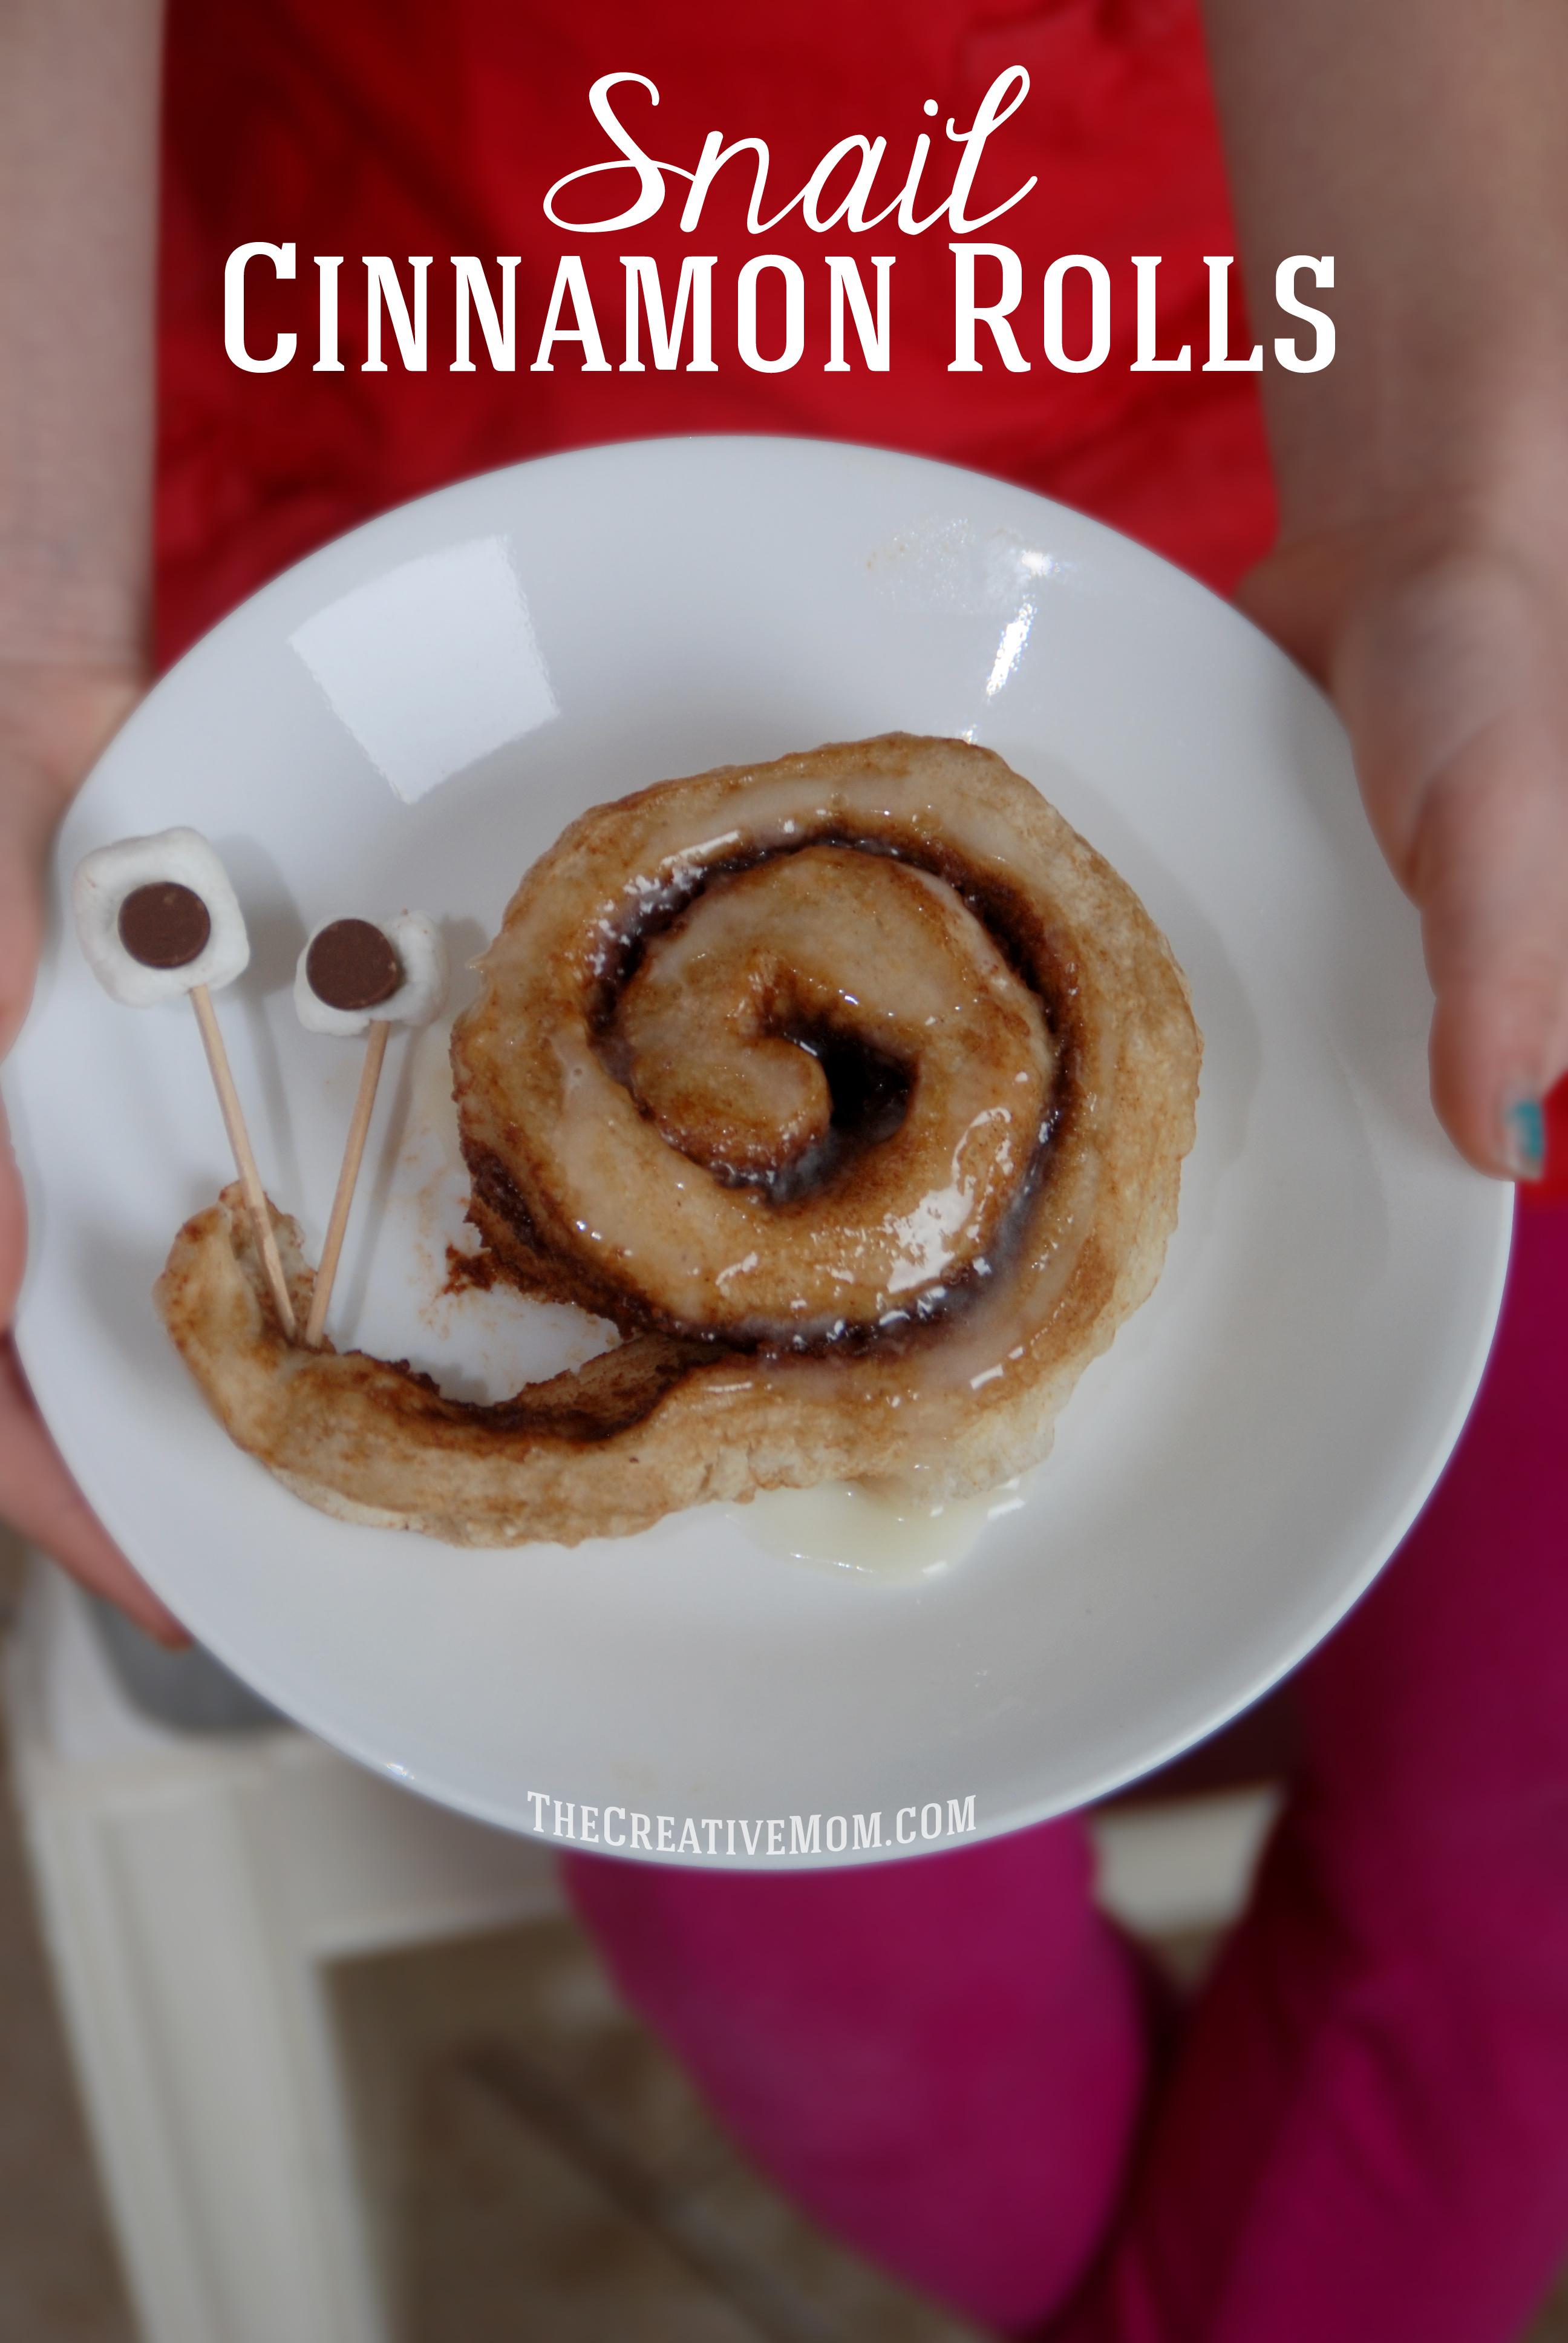 Snail Cinnamon Rolls